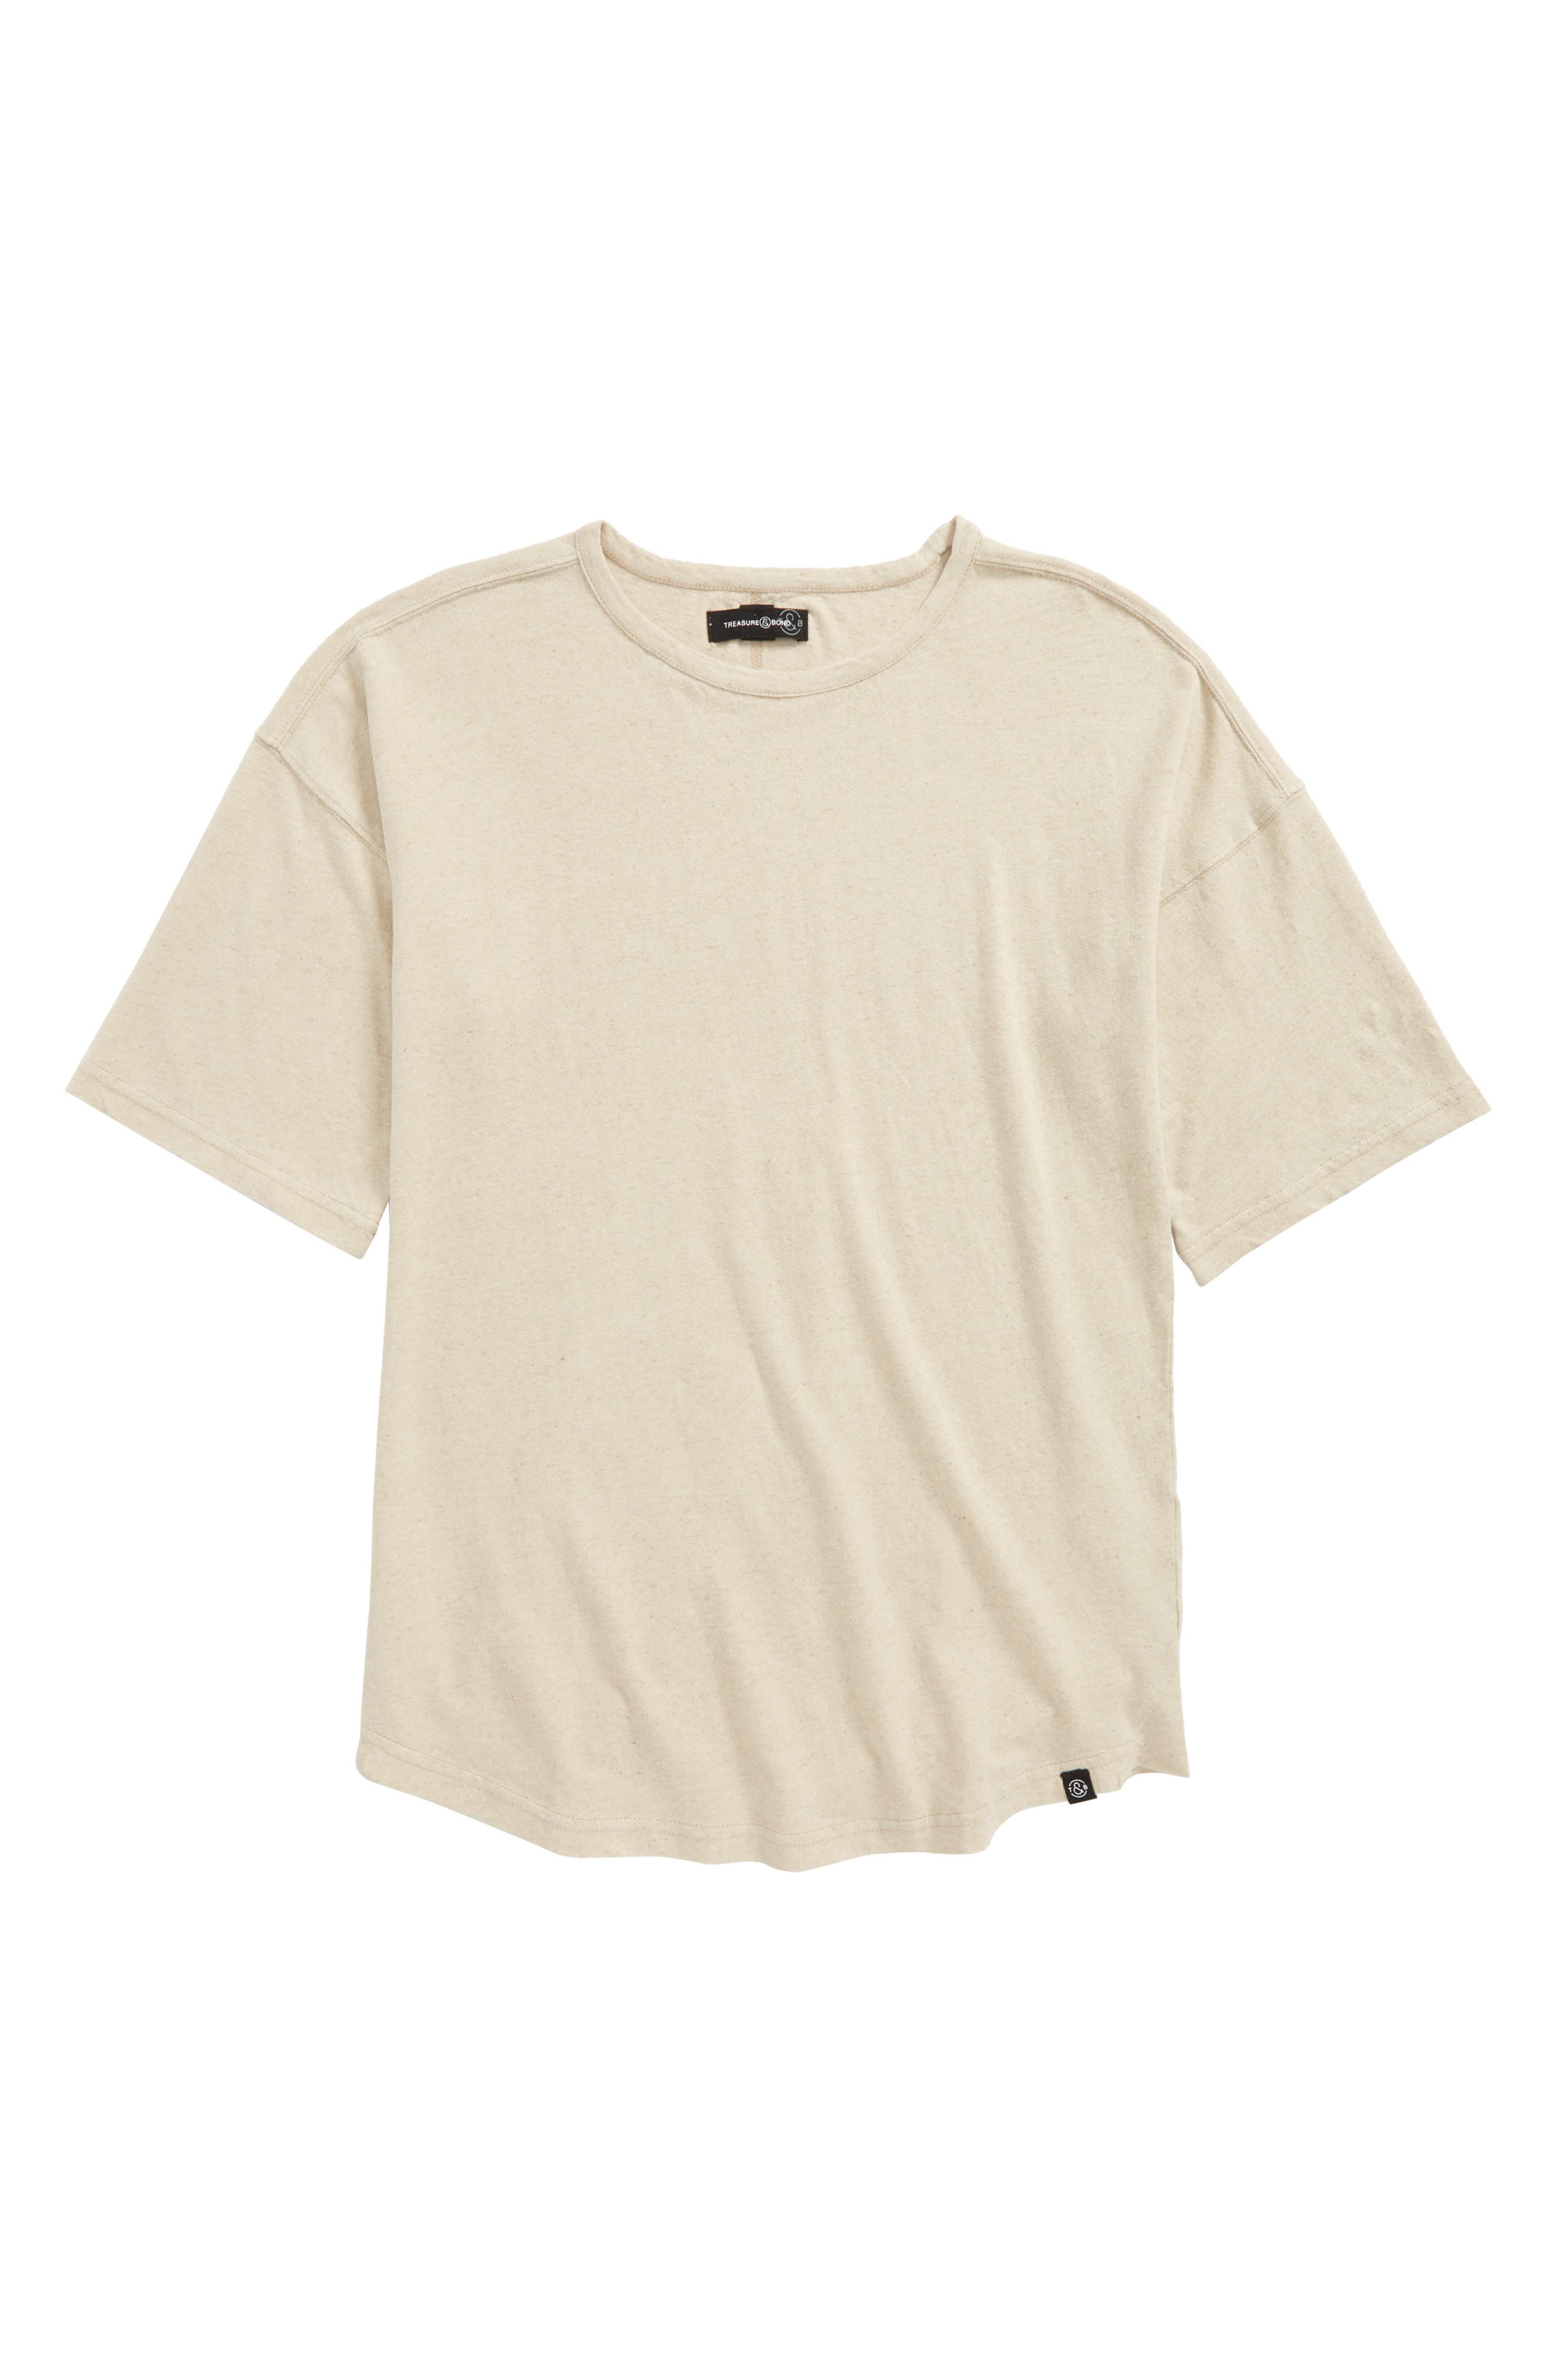 Dropped Shoulder Shirt,                         Main,                         color, 270